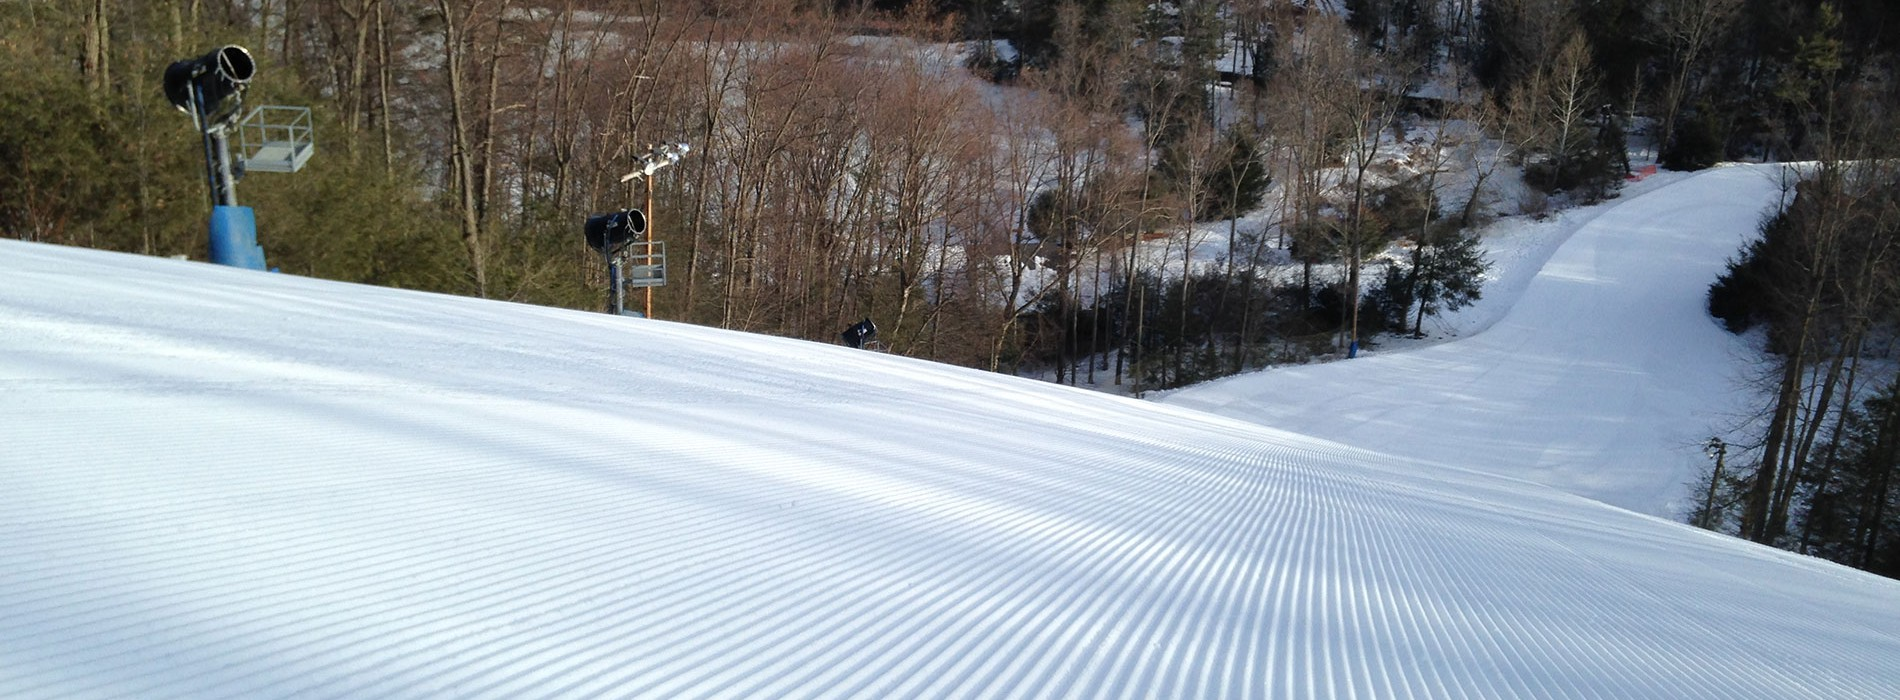 slope-1900x700